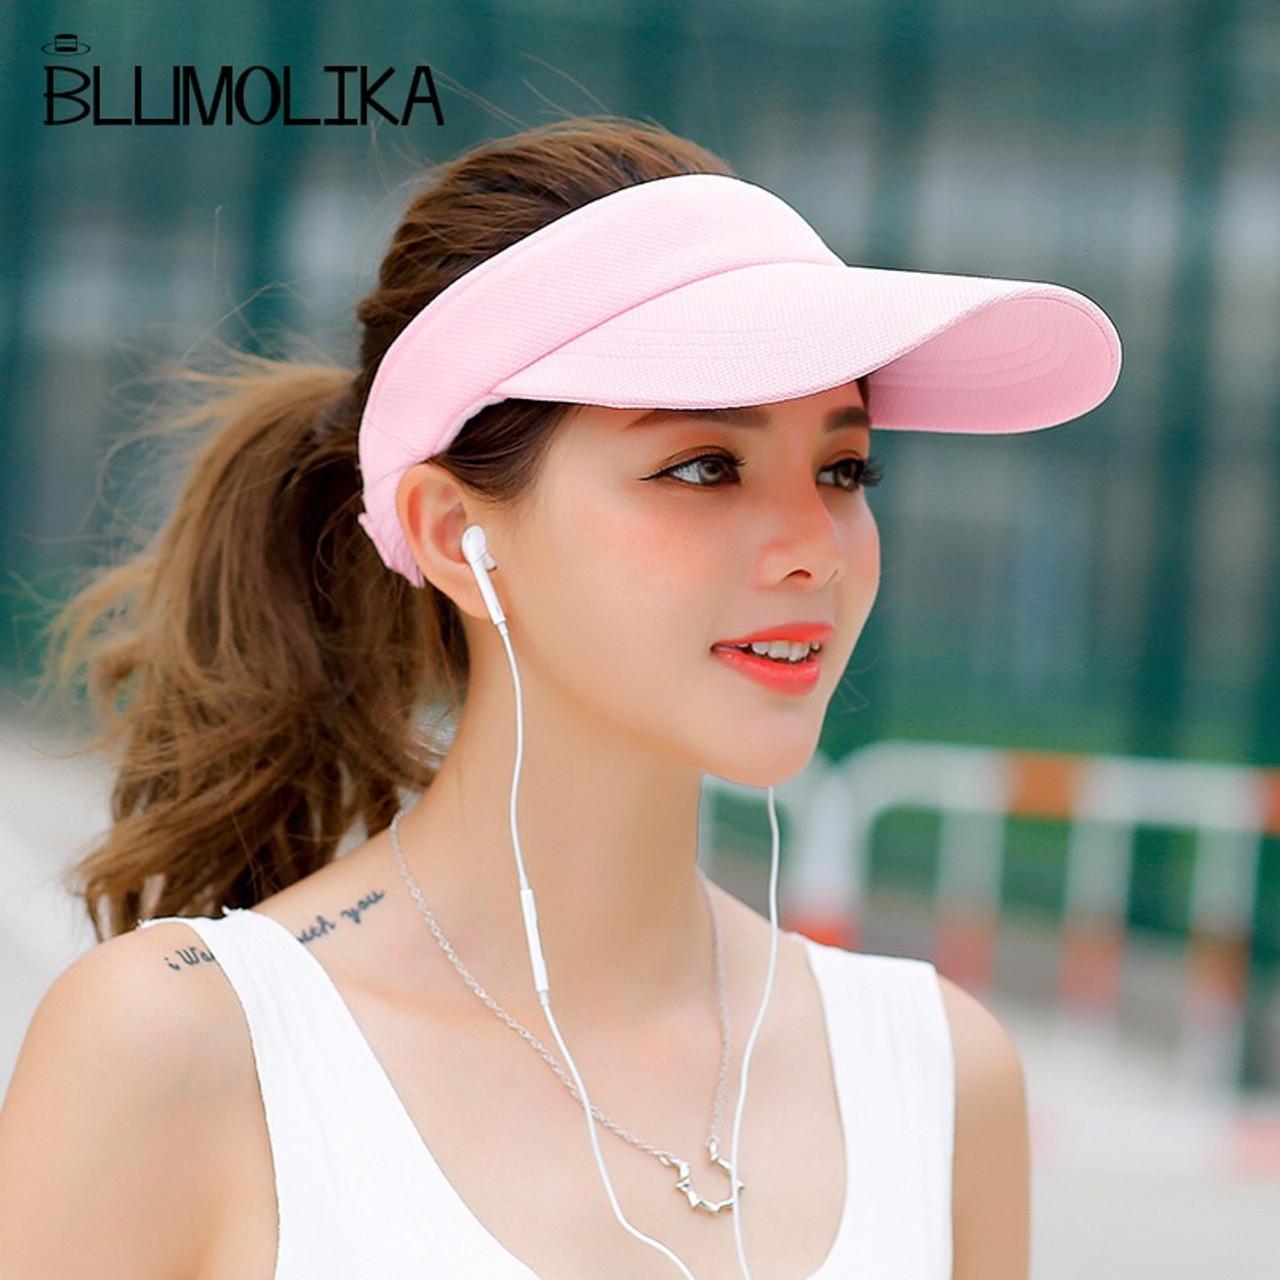 size 40 7f440 a3d28 ... Hot Selling New Tennis Caps Stylish Women Men Unisex Beach Sports Sun  Visor Hat Golf Caps ...